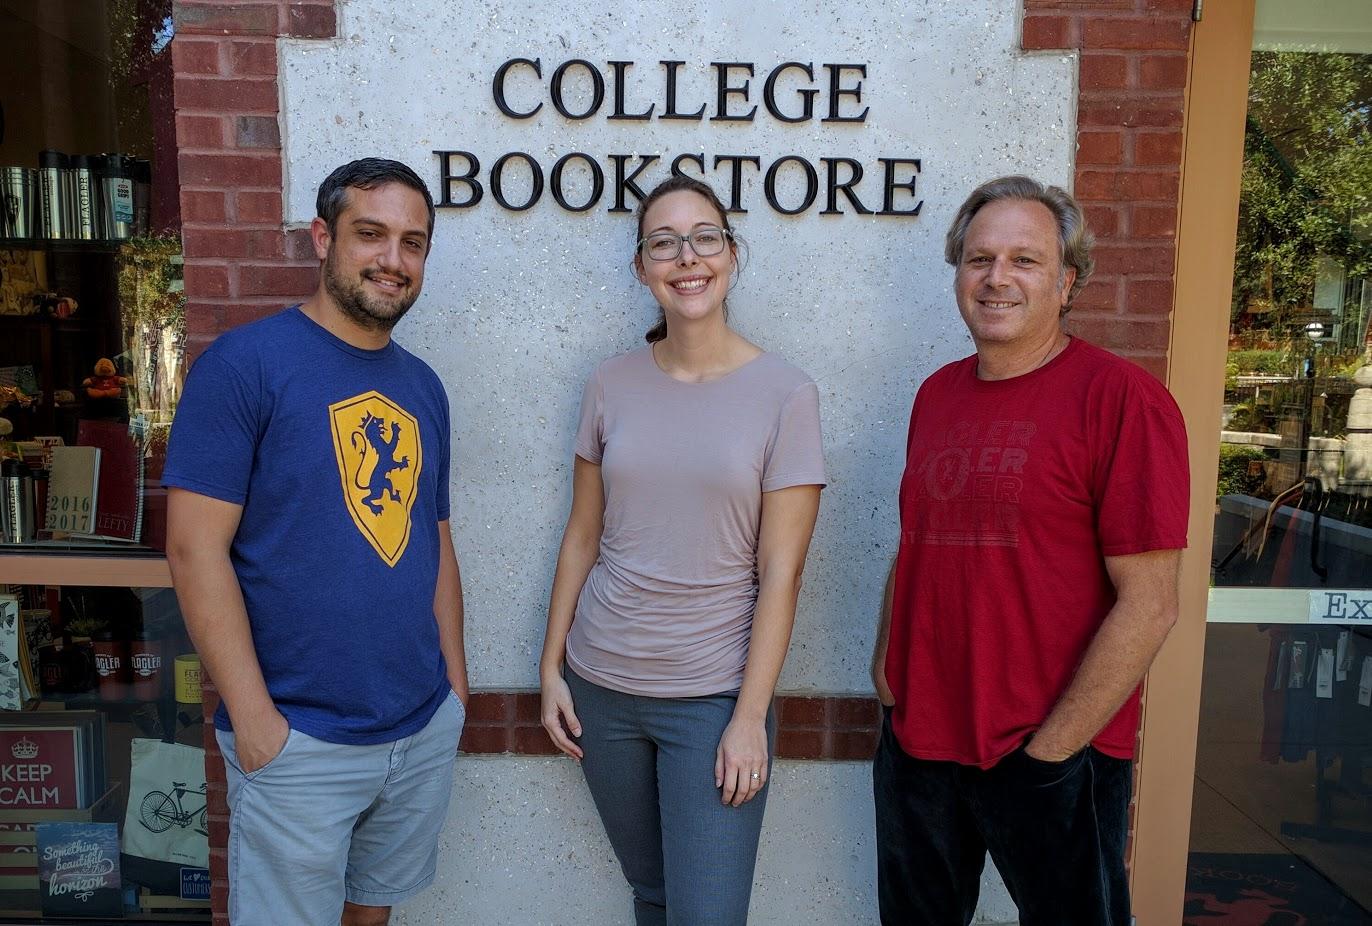 Pete Previte, Nichol Weisbecker and Trevor Smith, Flagler College Bookstore